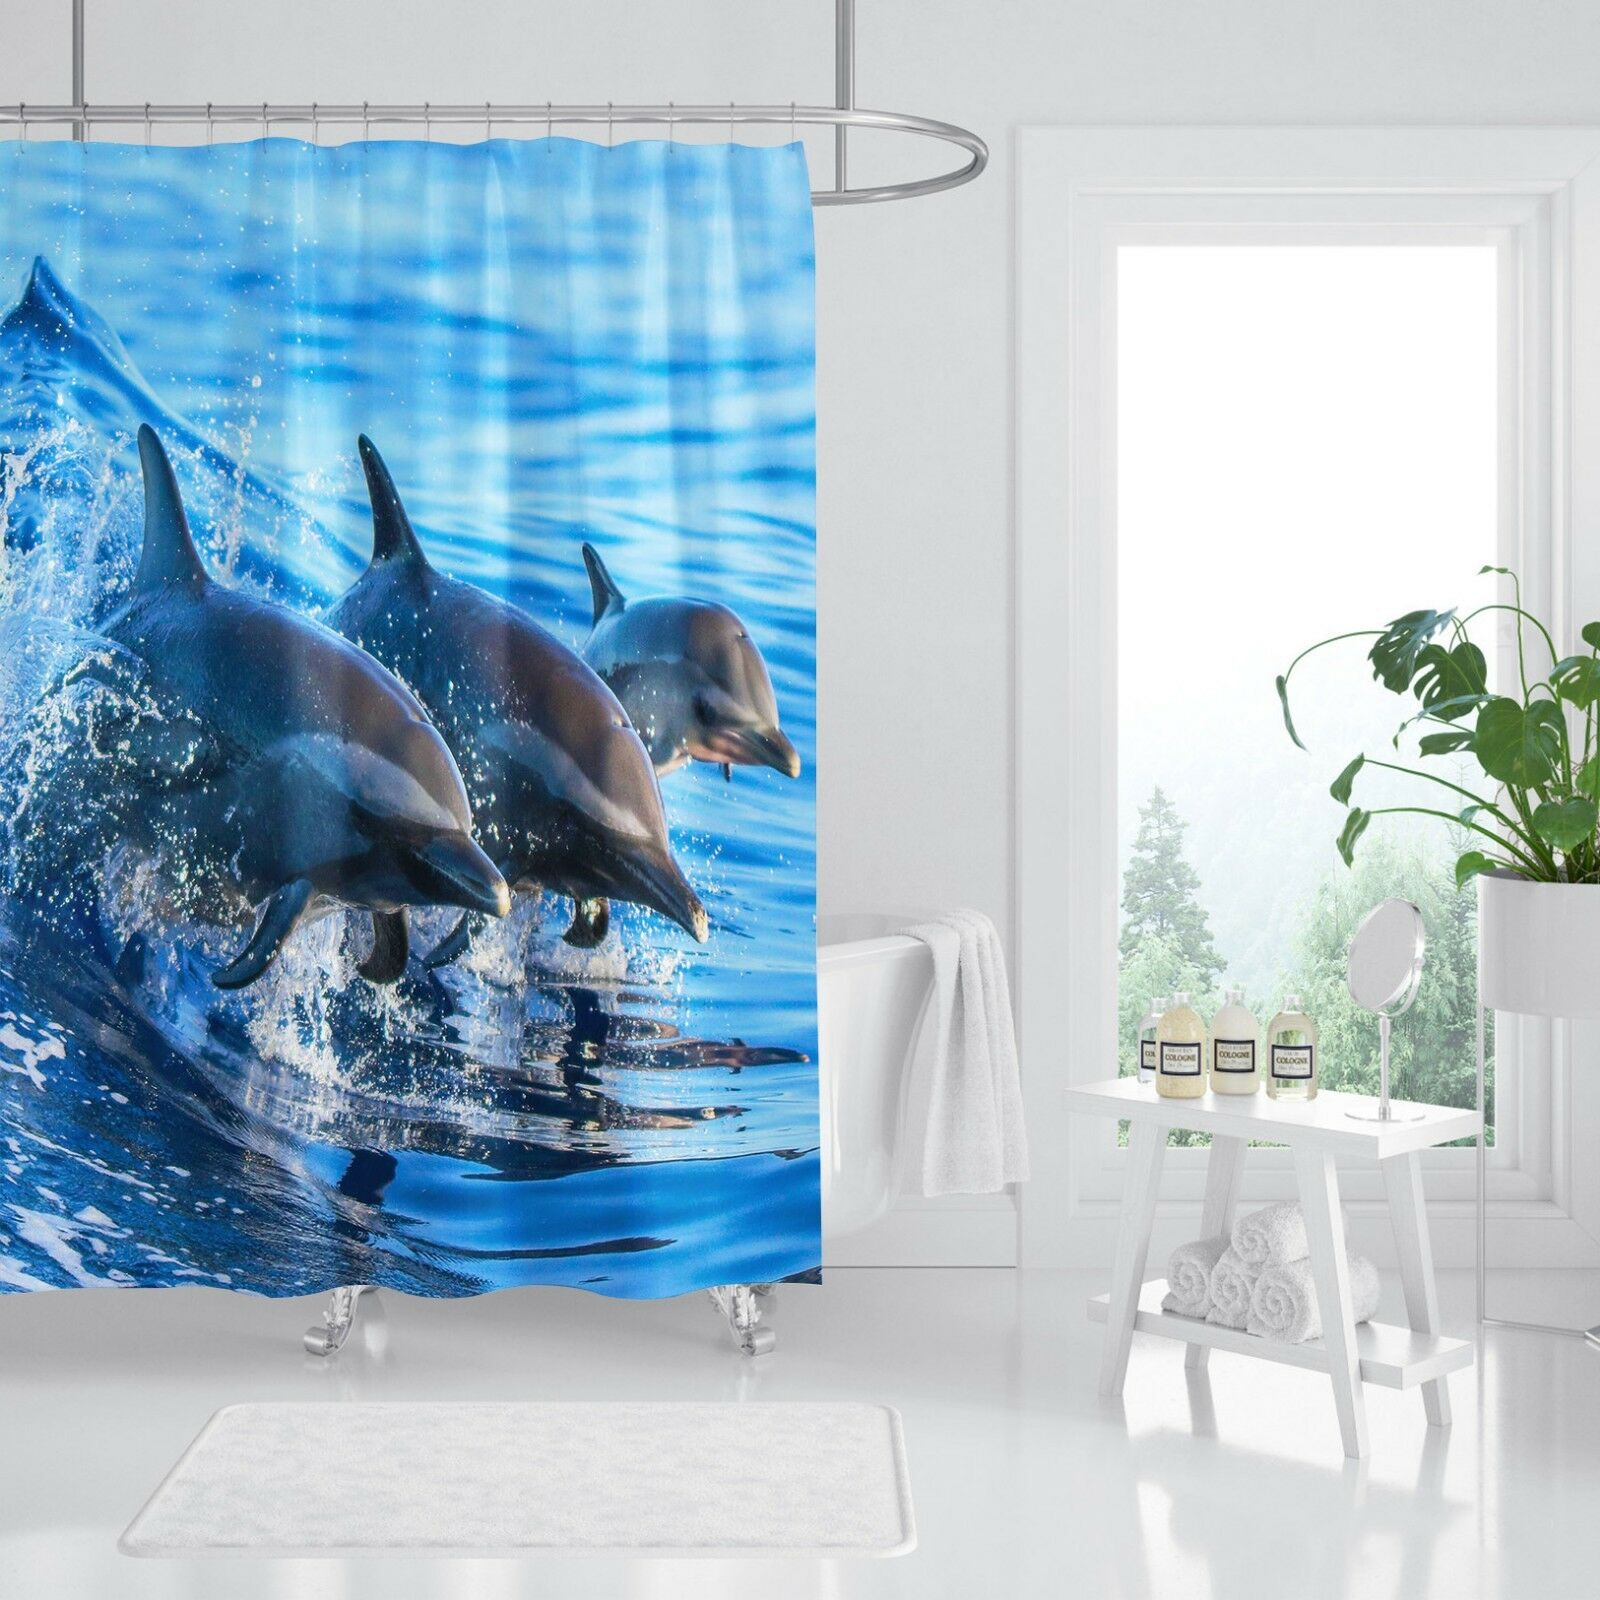 Océano Delfín 3D 44 Fibra Impermeable Baño Cortina de Ducha Baño Hogar Windows